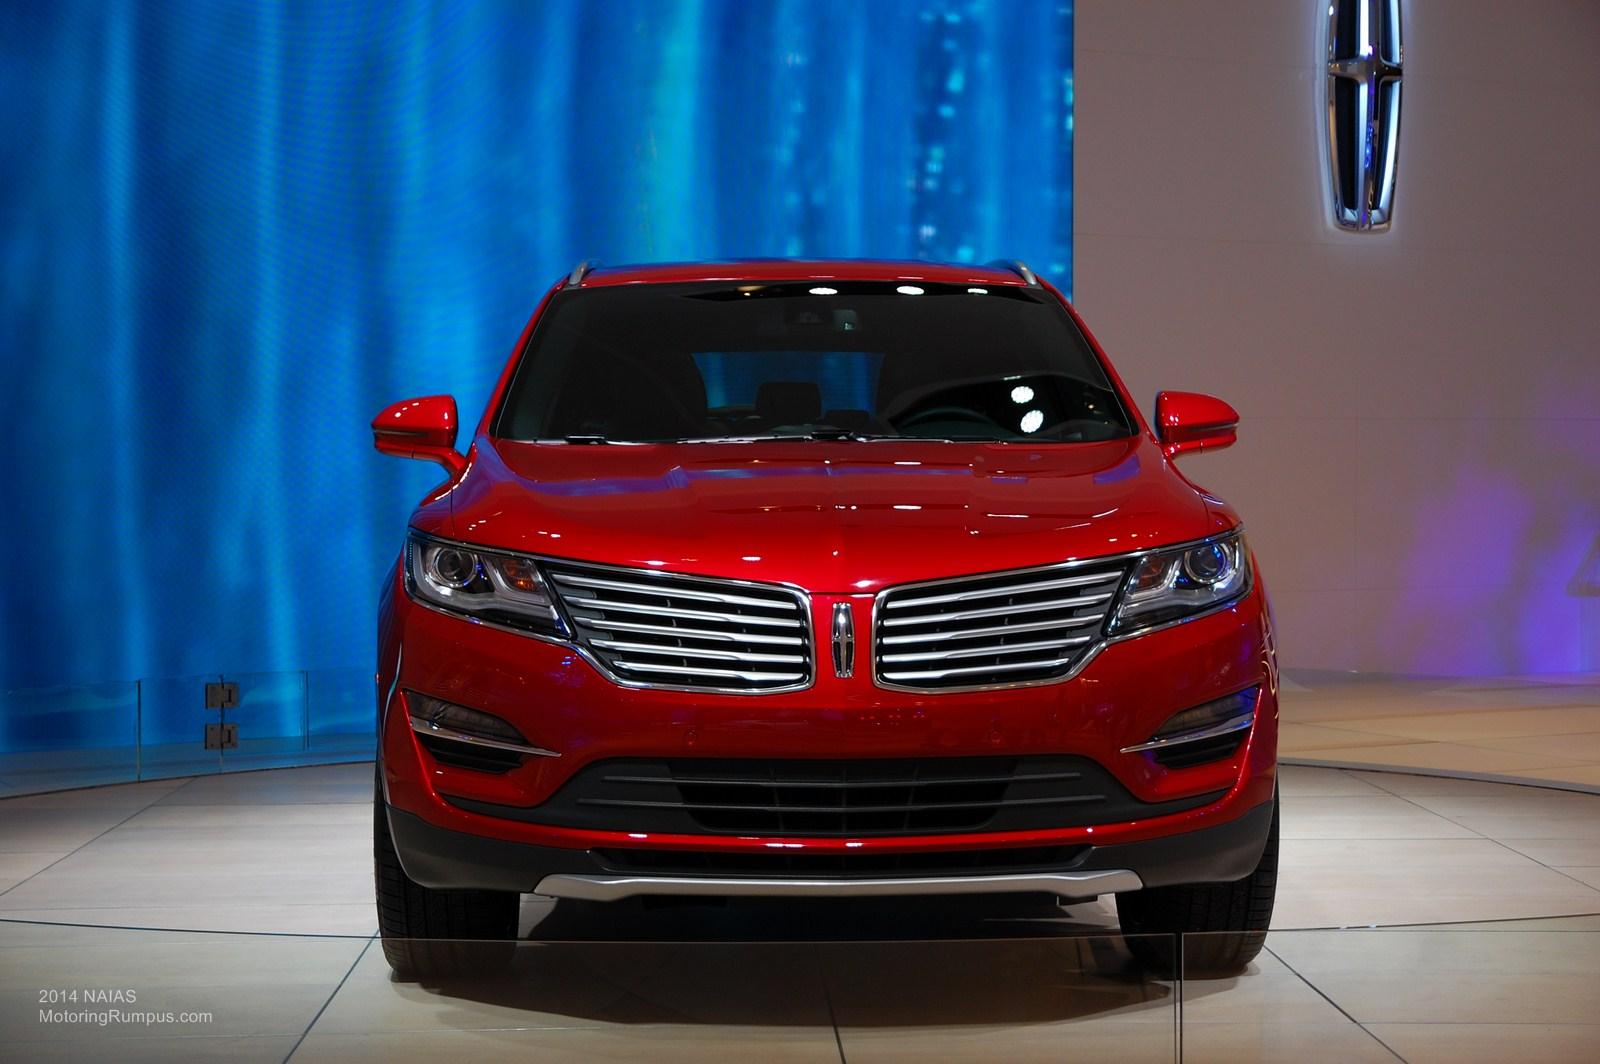 2014 NAIAS Lincoln MKC Front